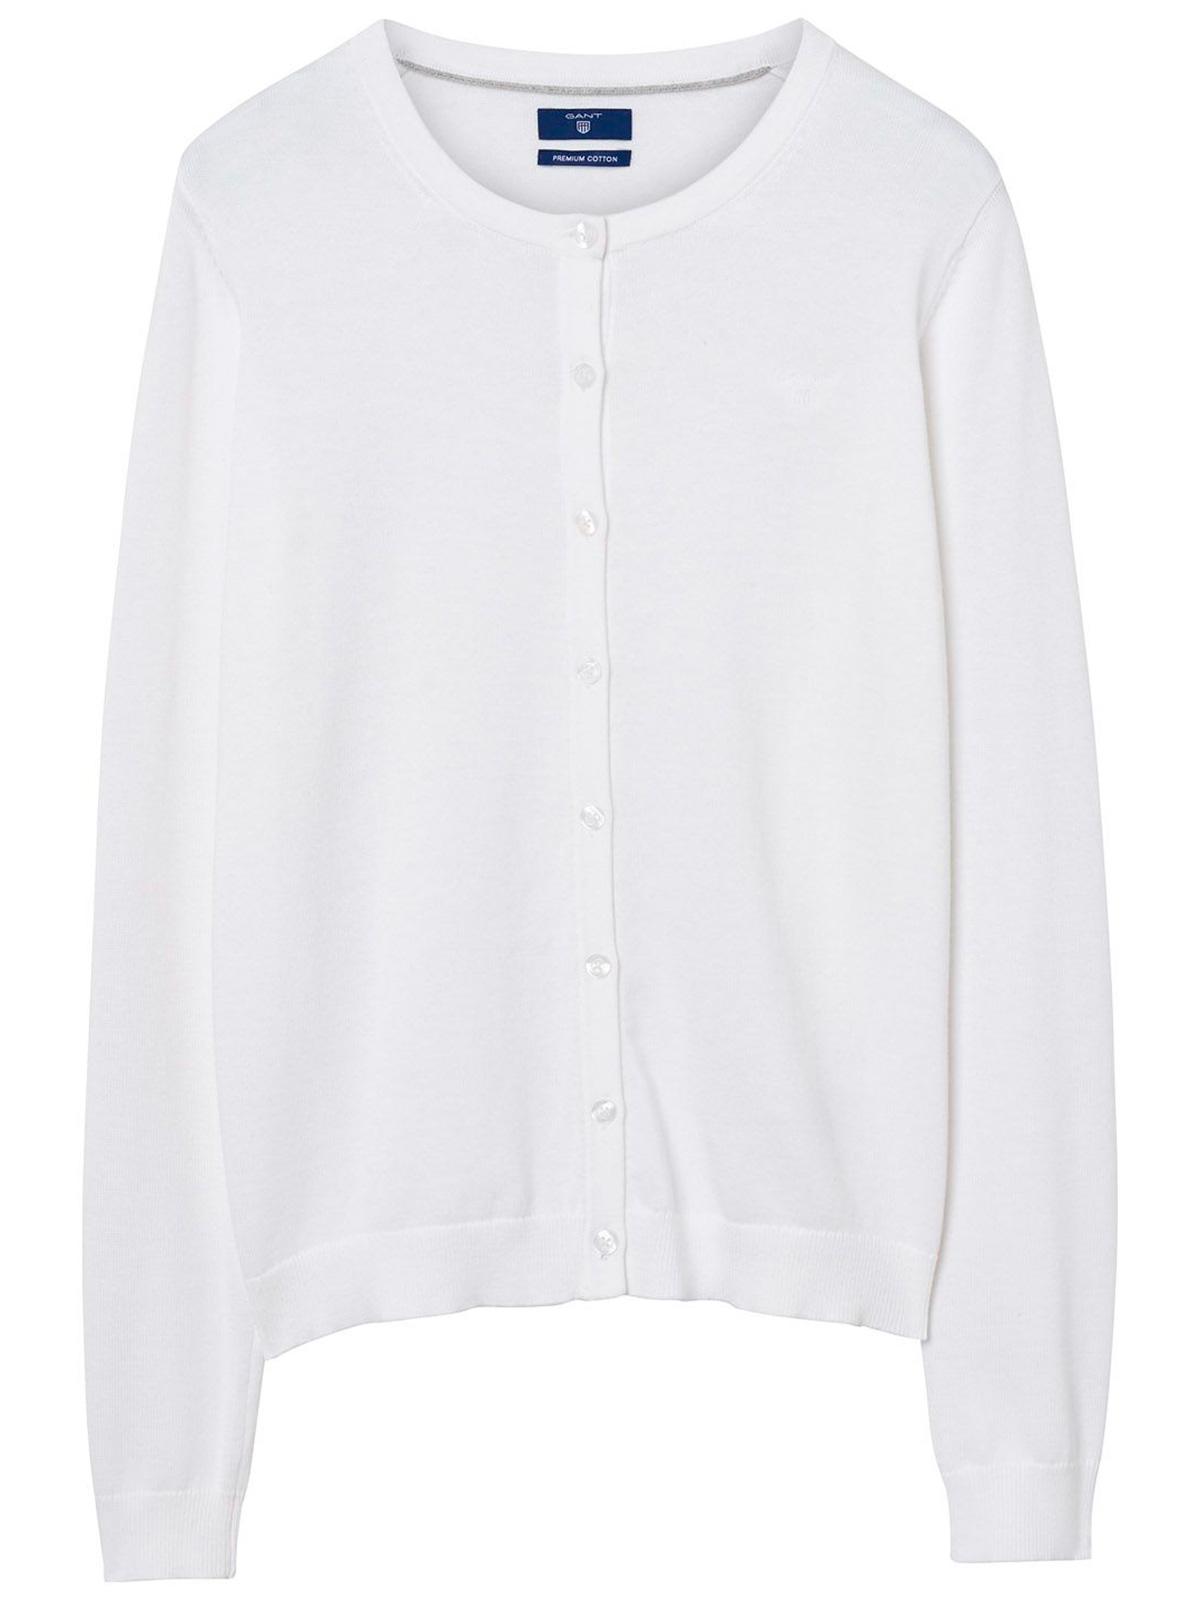 Picture of GANT | Women's Cotton Cardigan